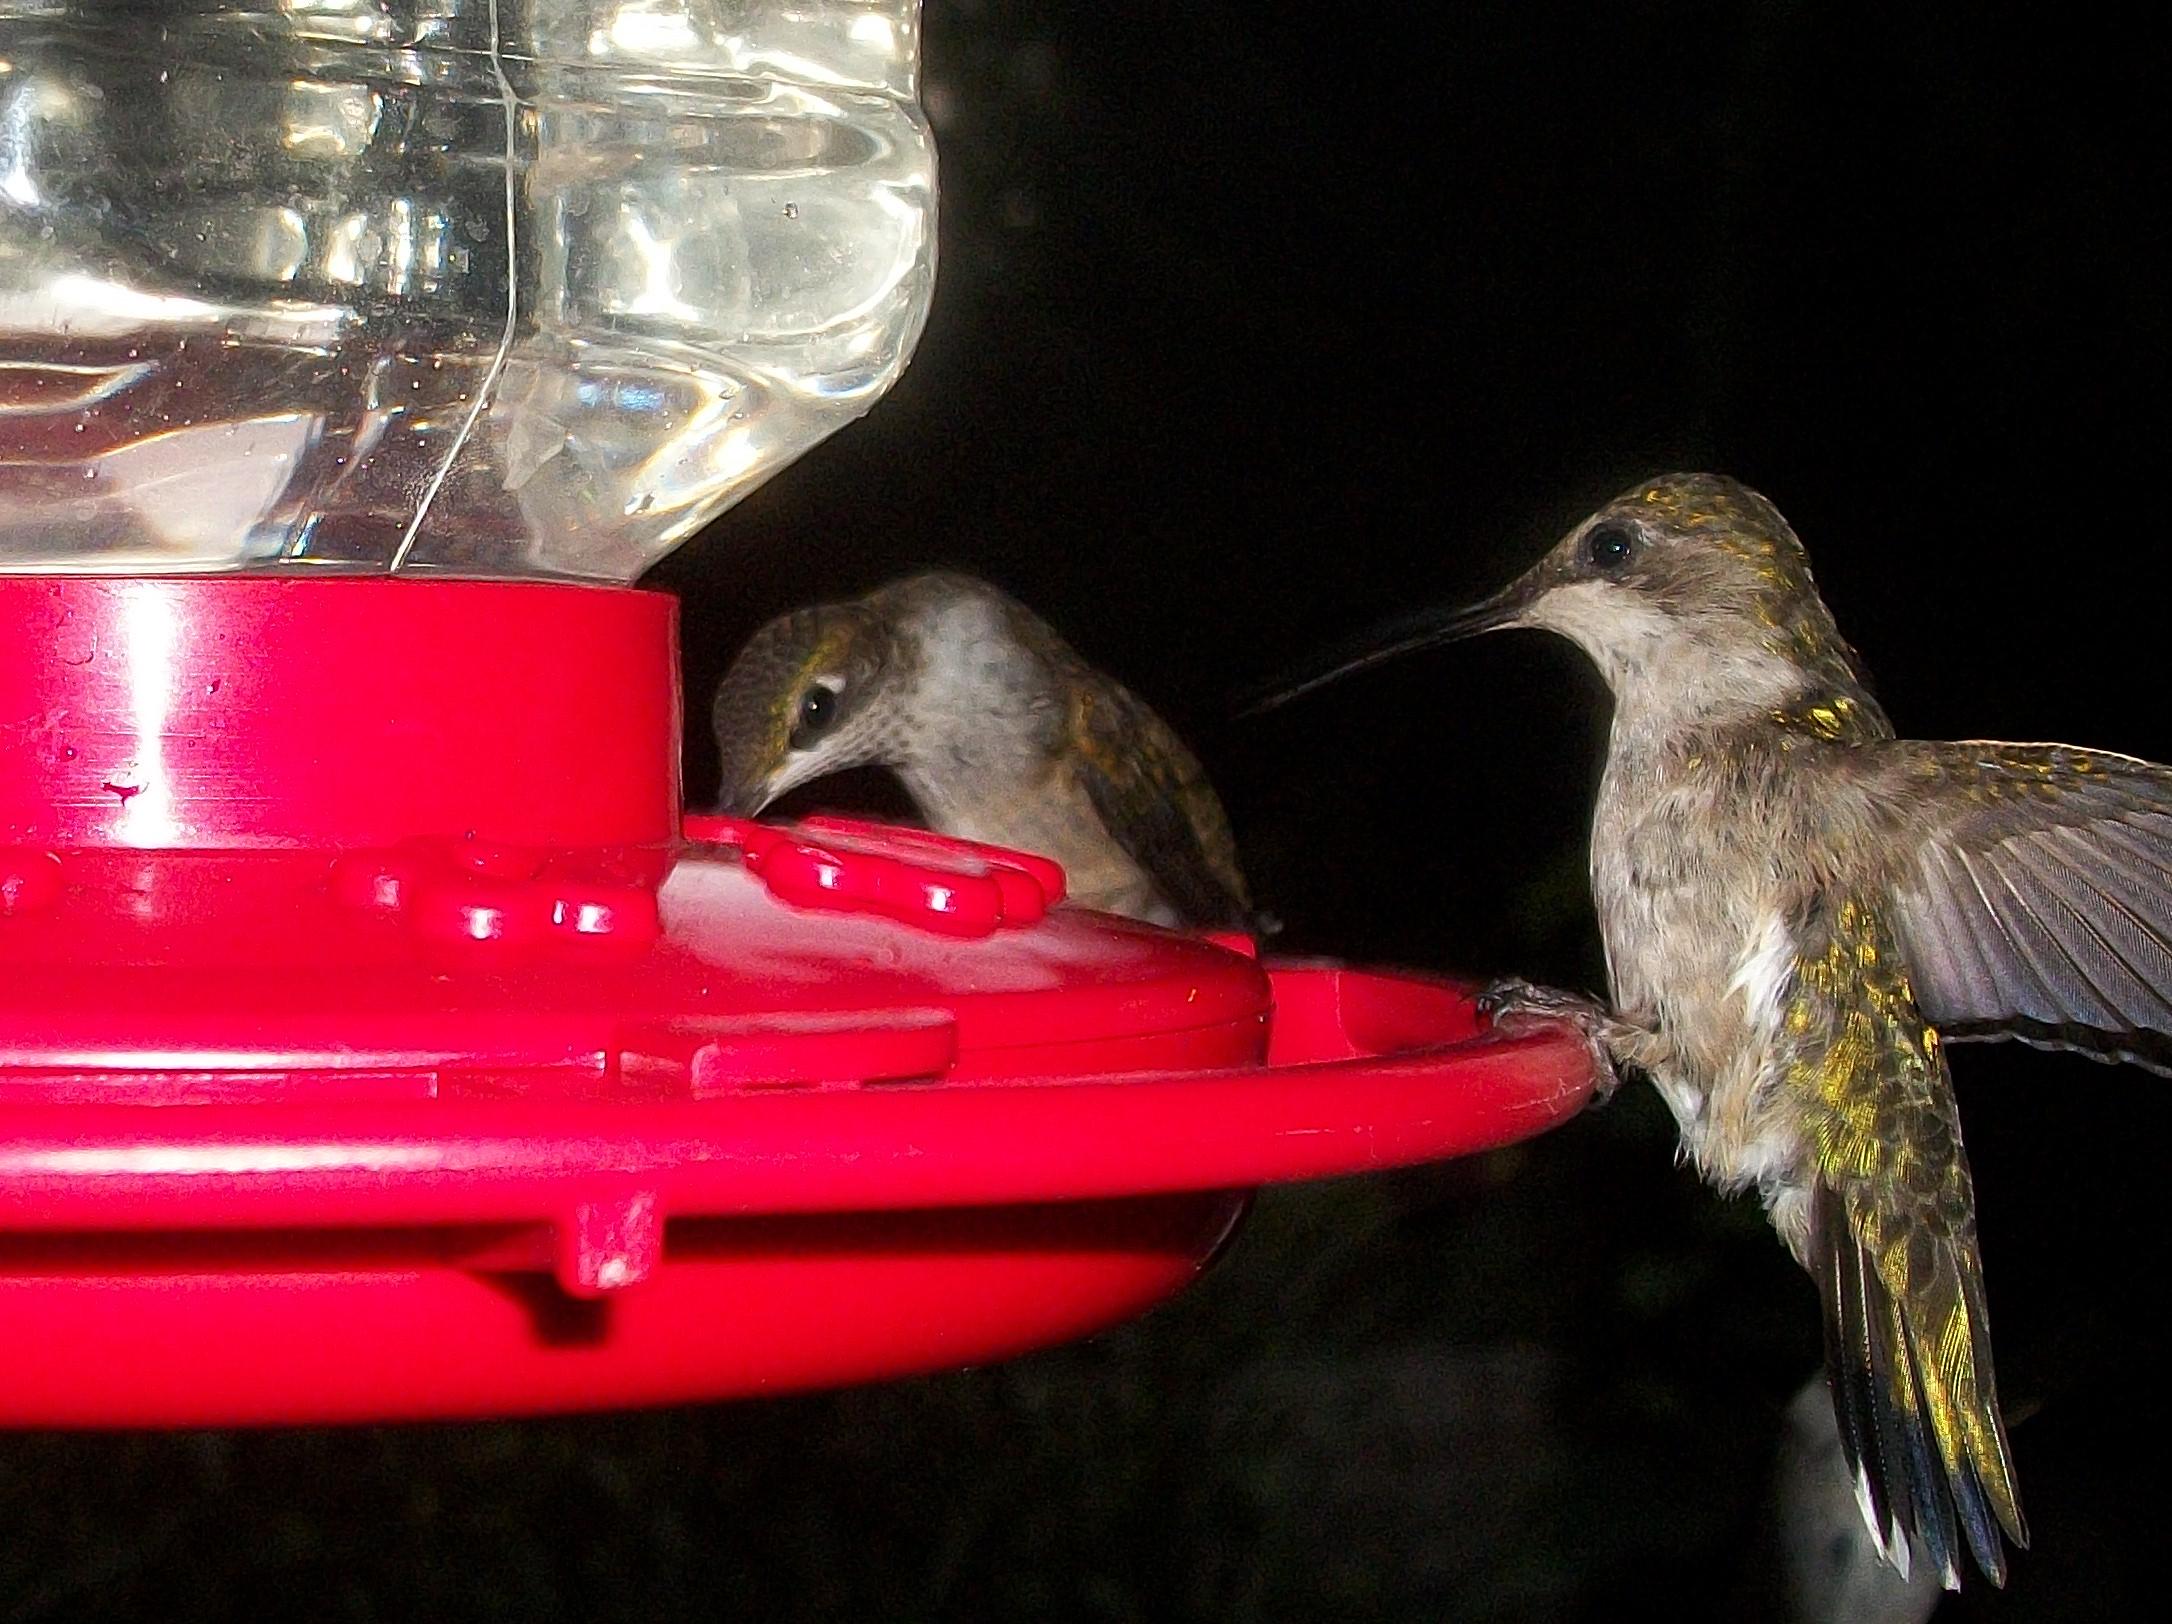 Thirsty birds photo